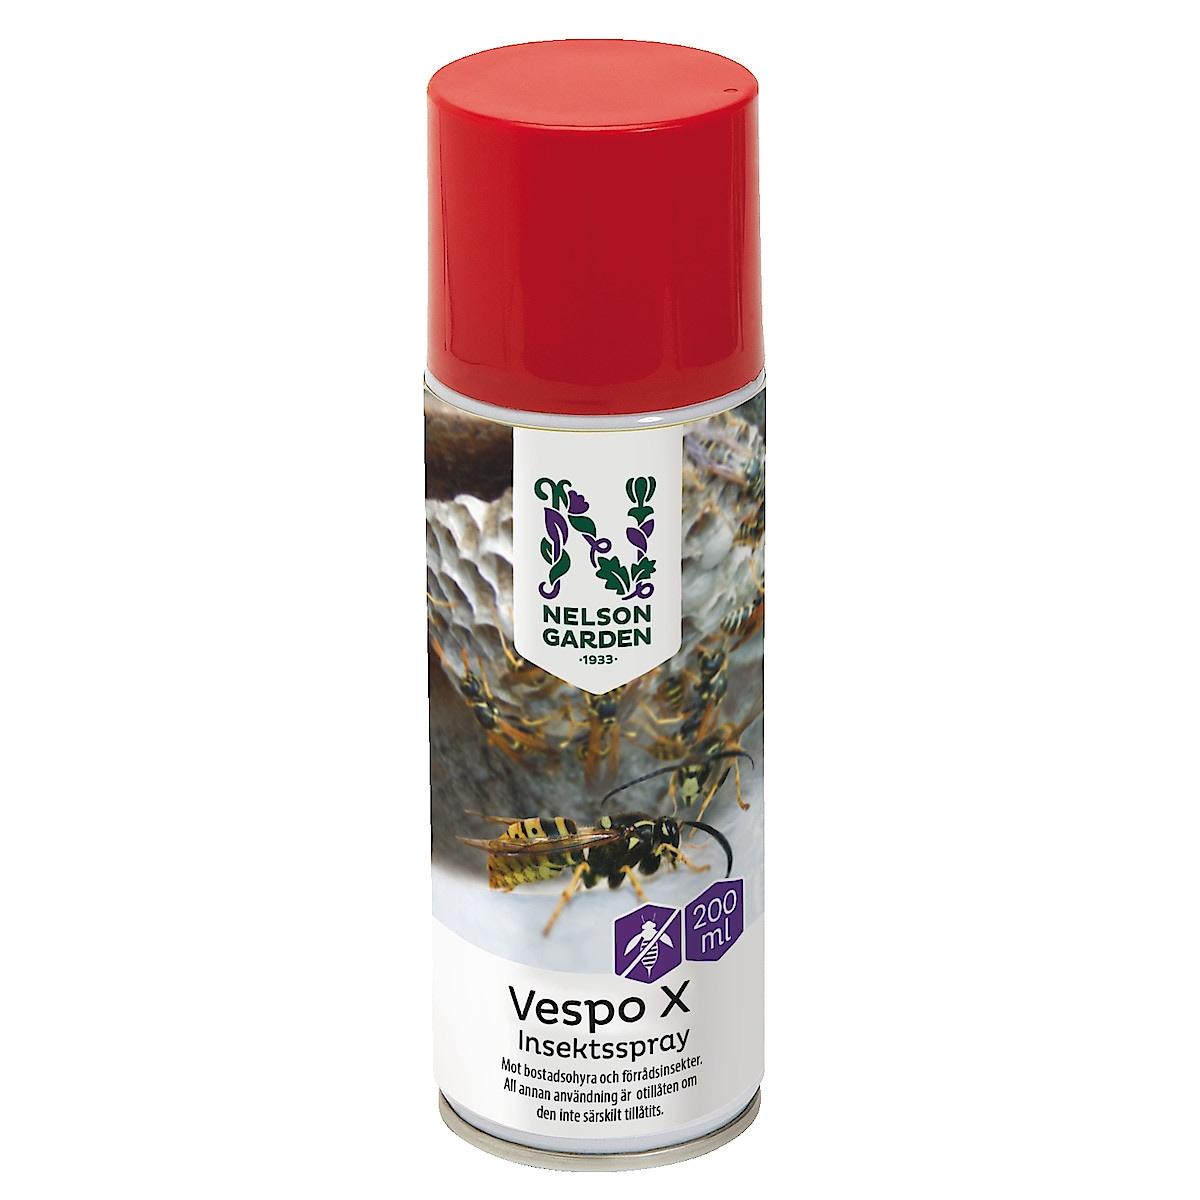 Insektsspray Vespo X Nelson Garden